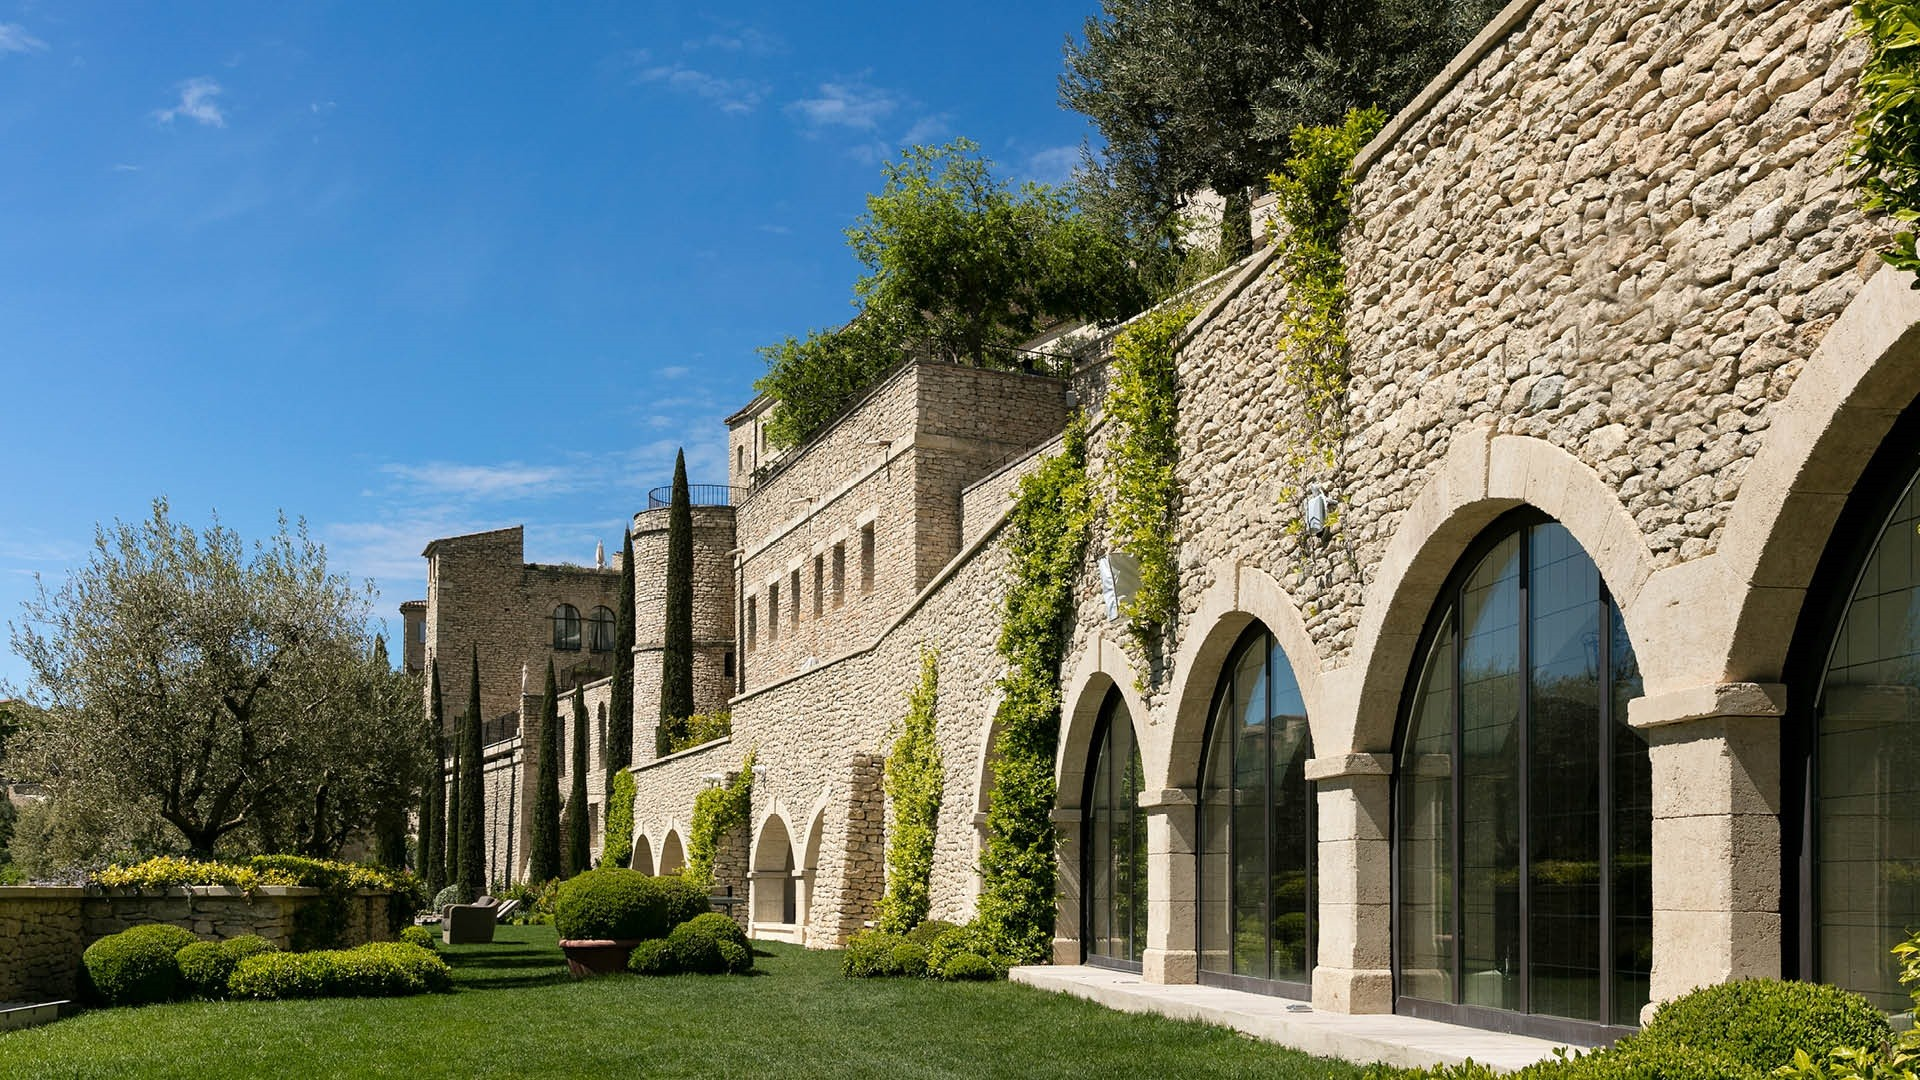 la-bastide-de-gordes-provence-luberon-jardins-suspendus-seminaires-de-caractere